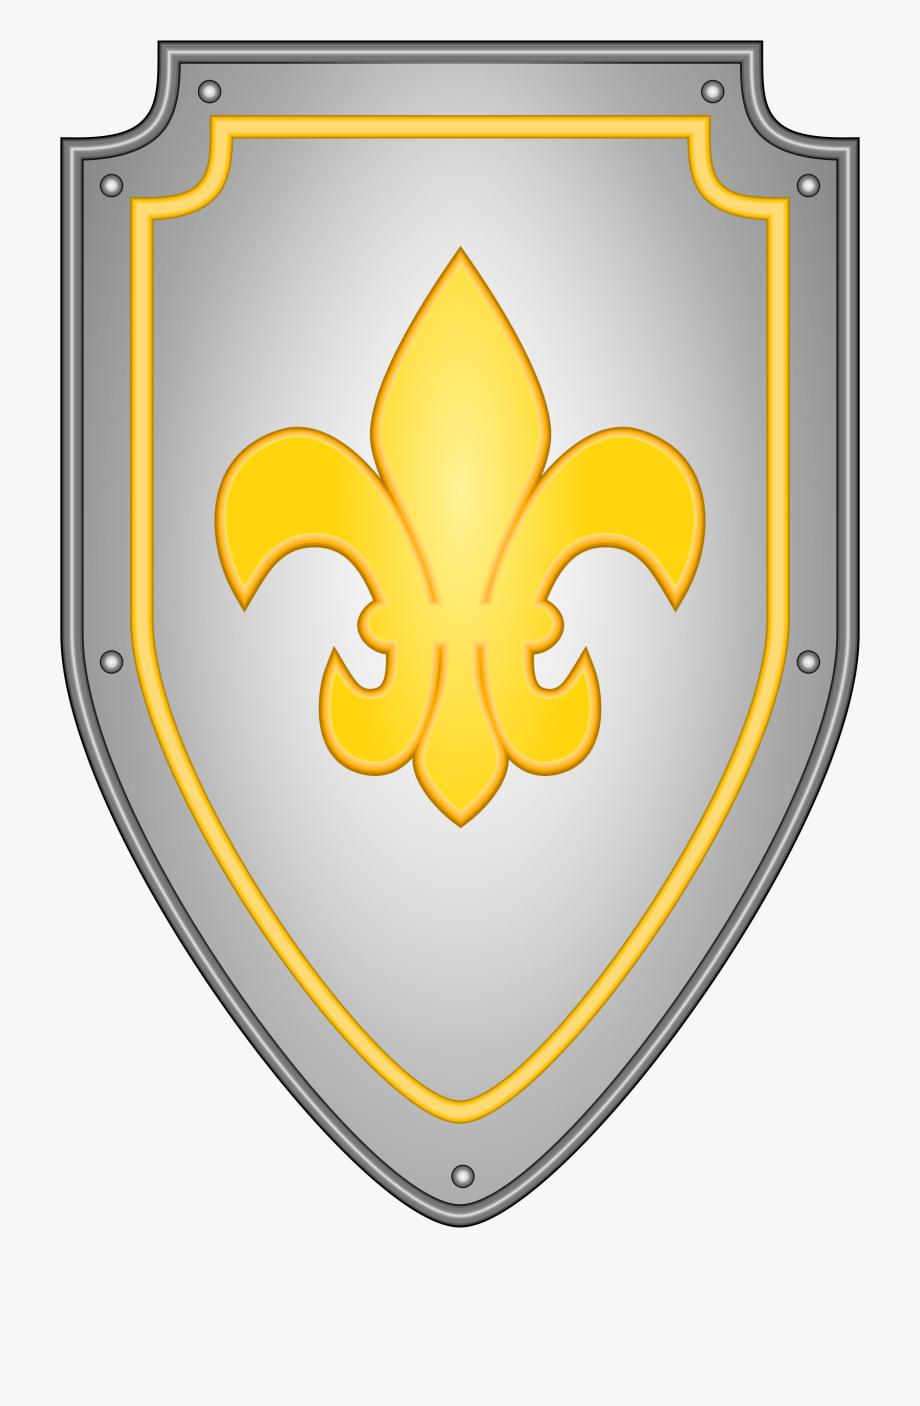 Shield knight shield.